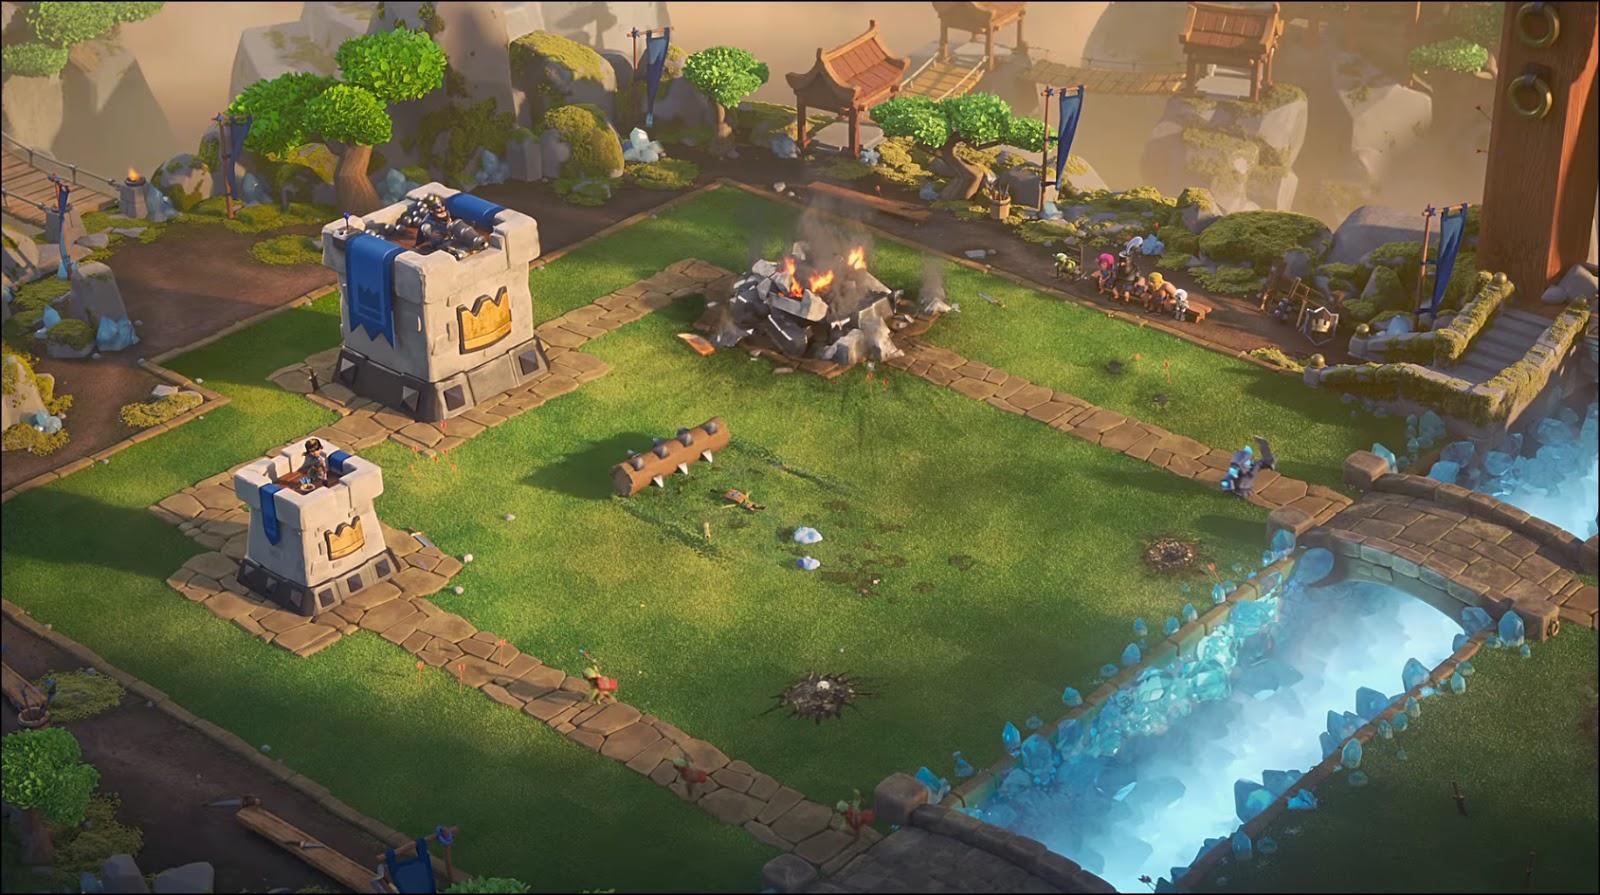 Wallpaper Clash Of Clans 3d Comercial De Clash Royale No Meu Tempo Anivers 225 Rio De